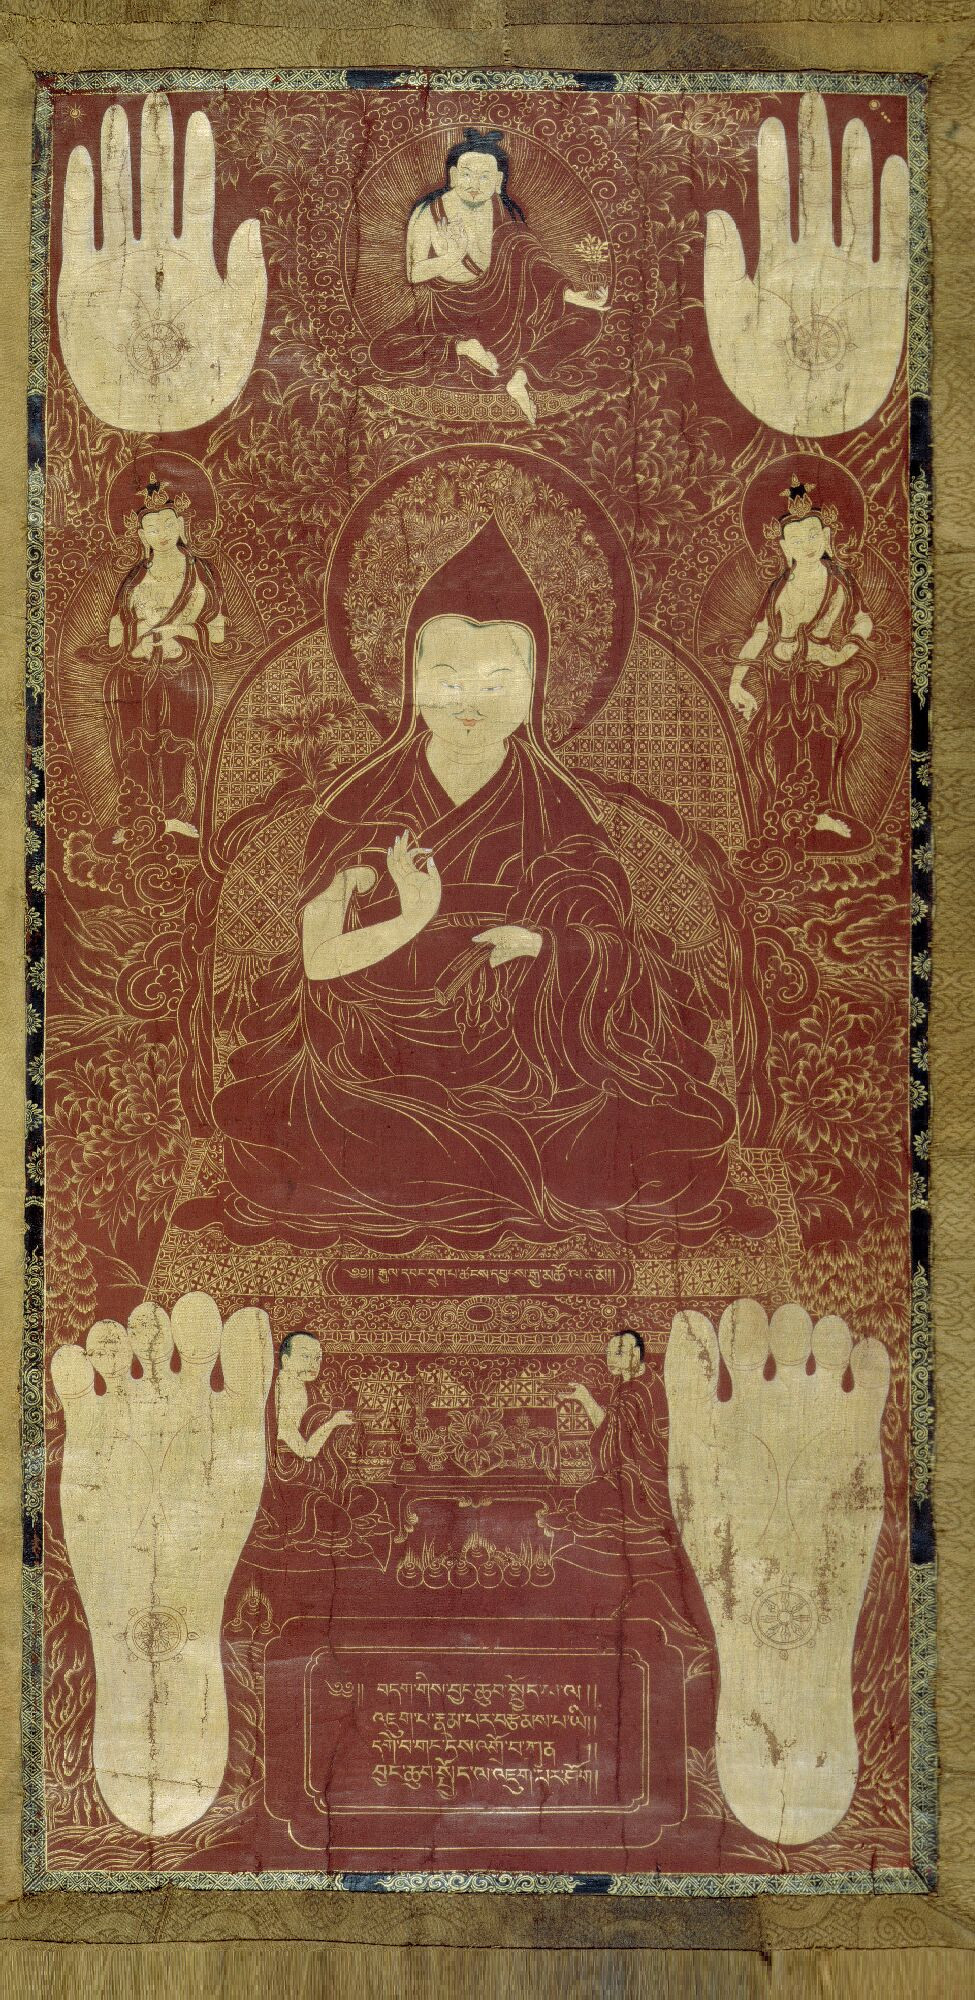 Dalai Lama Tsangyang Gyatso